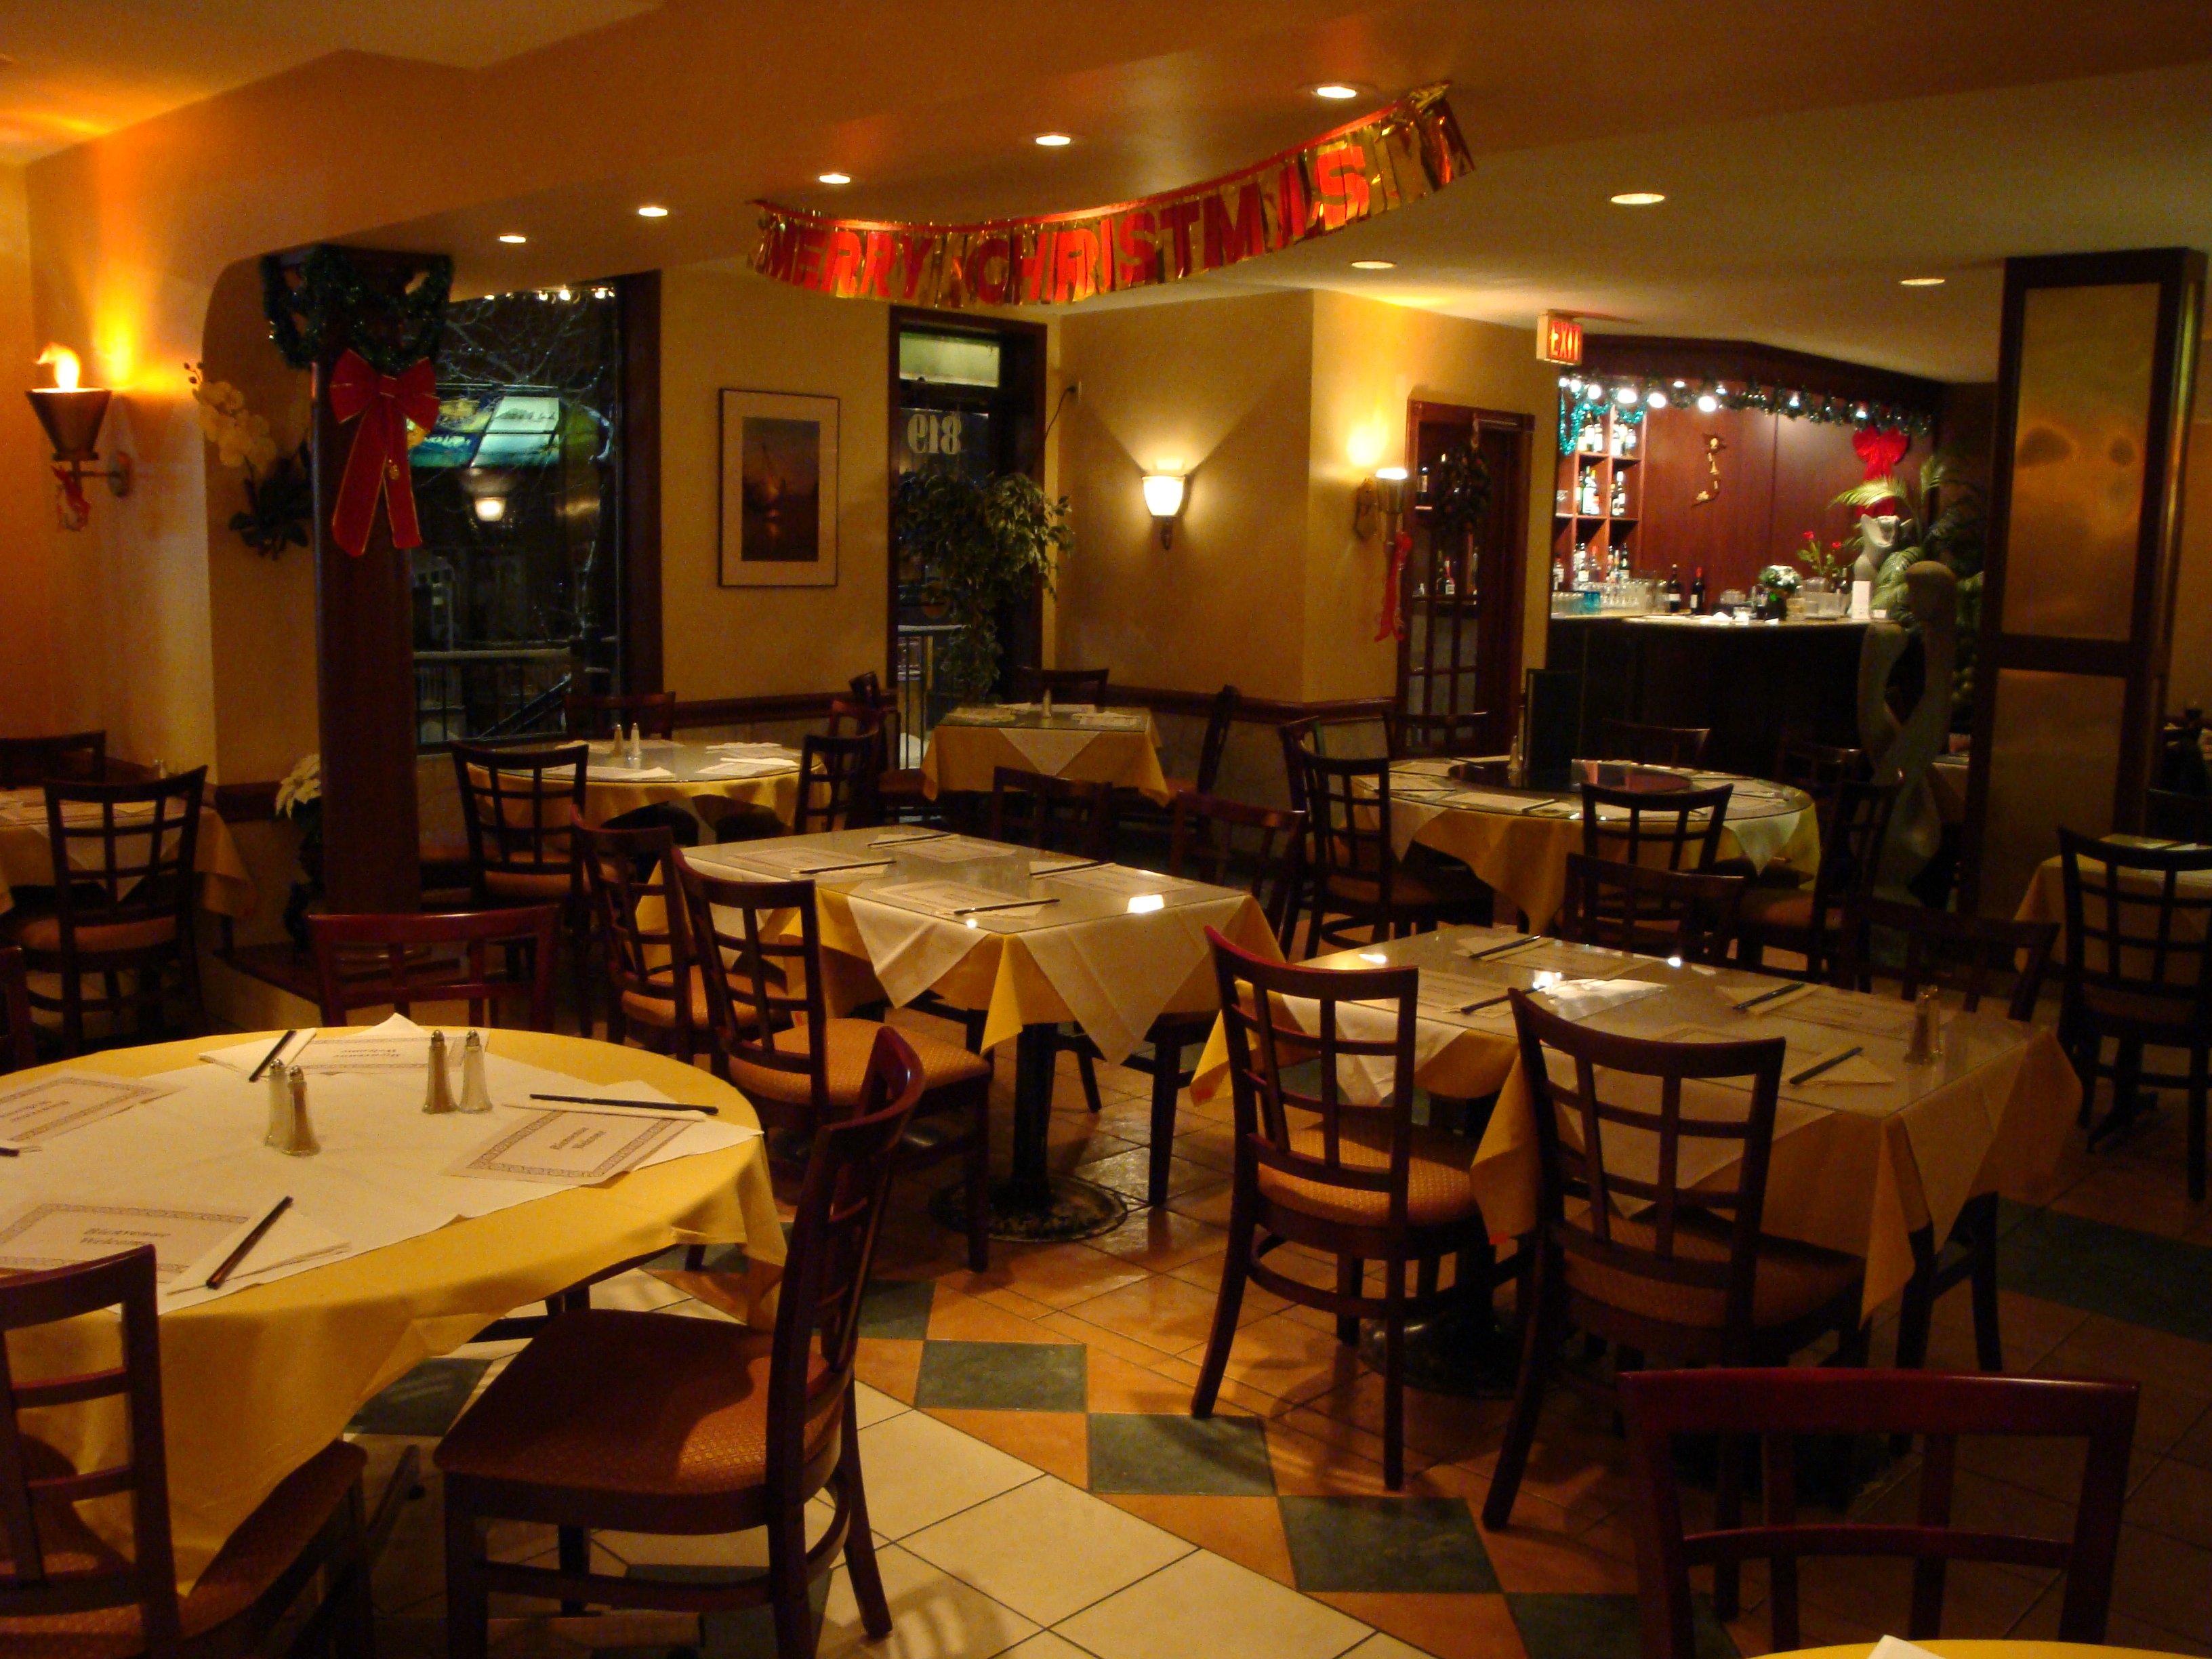 Who Accepts Amex >> Vietnam Palace Restaurant, 819 SOMERSET ST W, Ottawa Chinatown